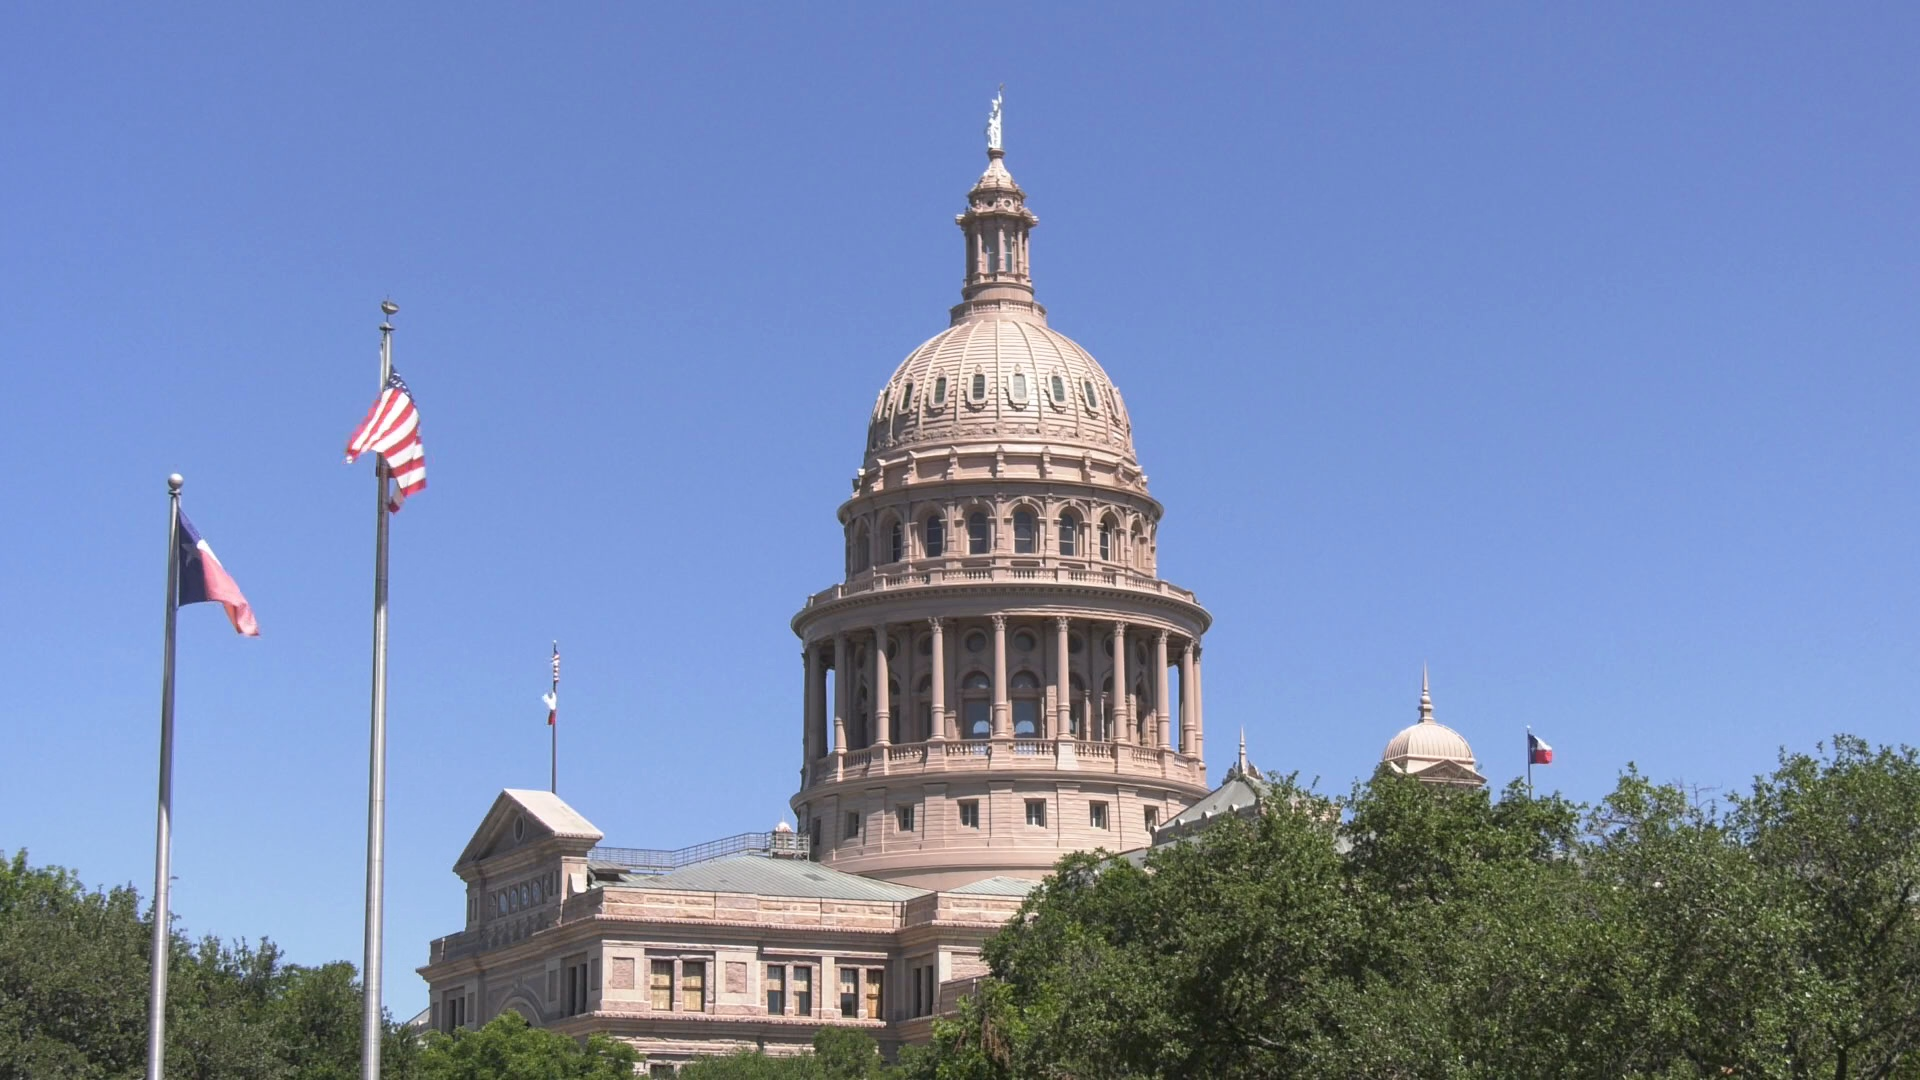 Machinists Applaud Texas Lawmakers Pushing Back on Harmful Voter Suppression Legislation